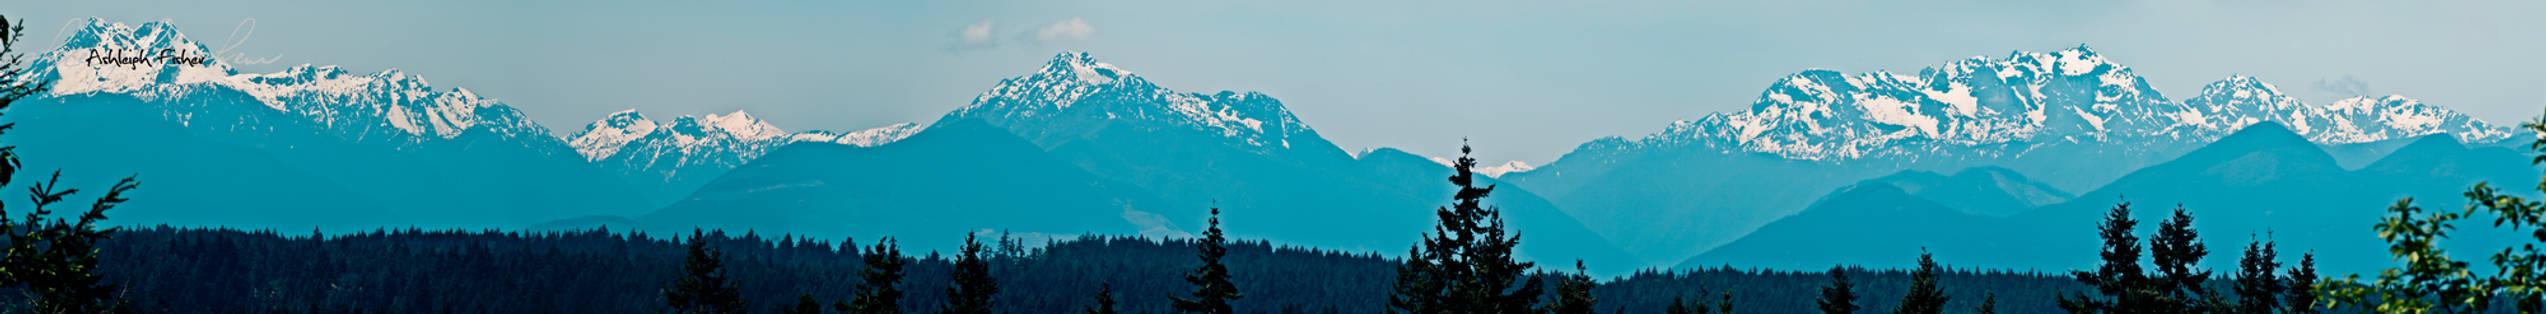 Olympic Mountains Panorama